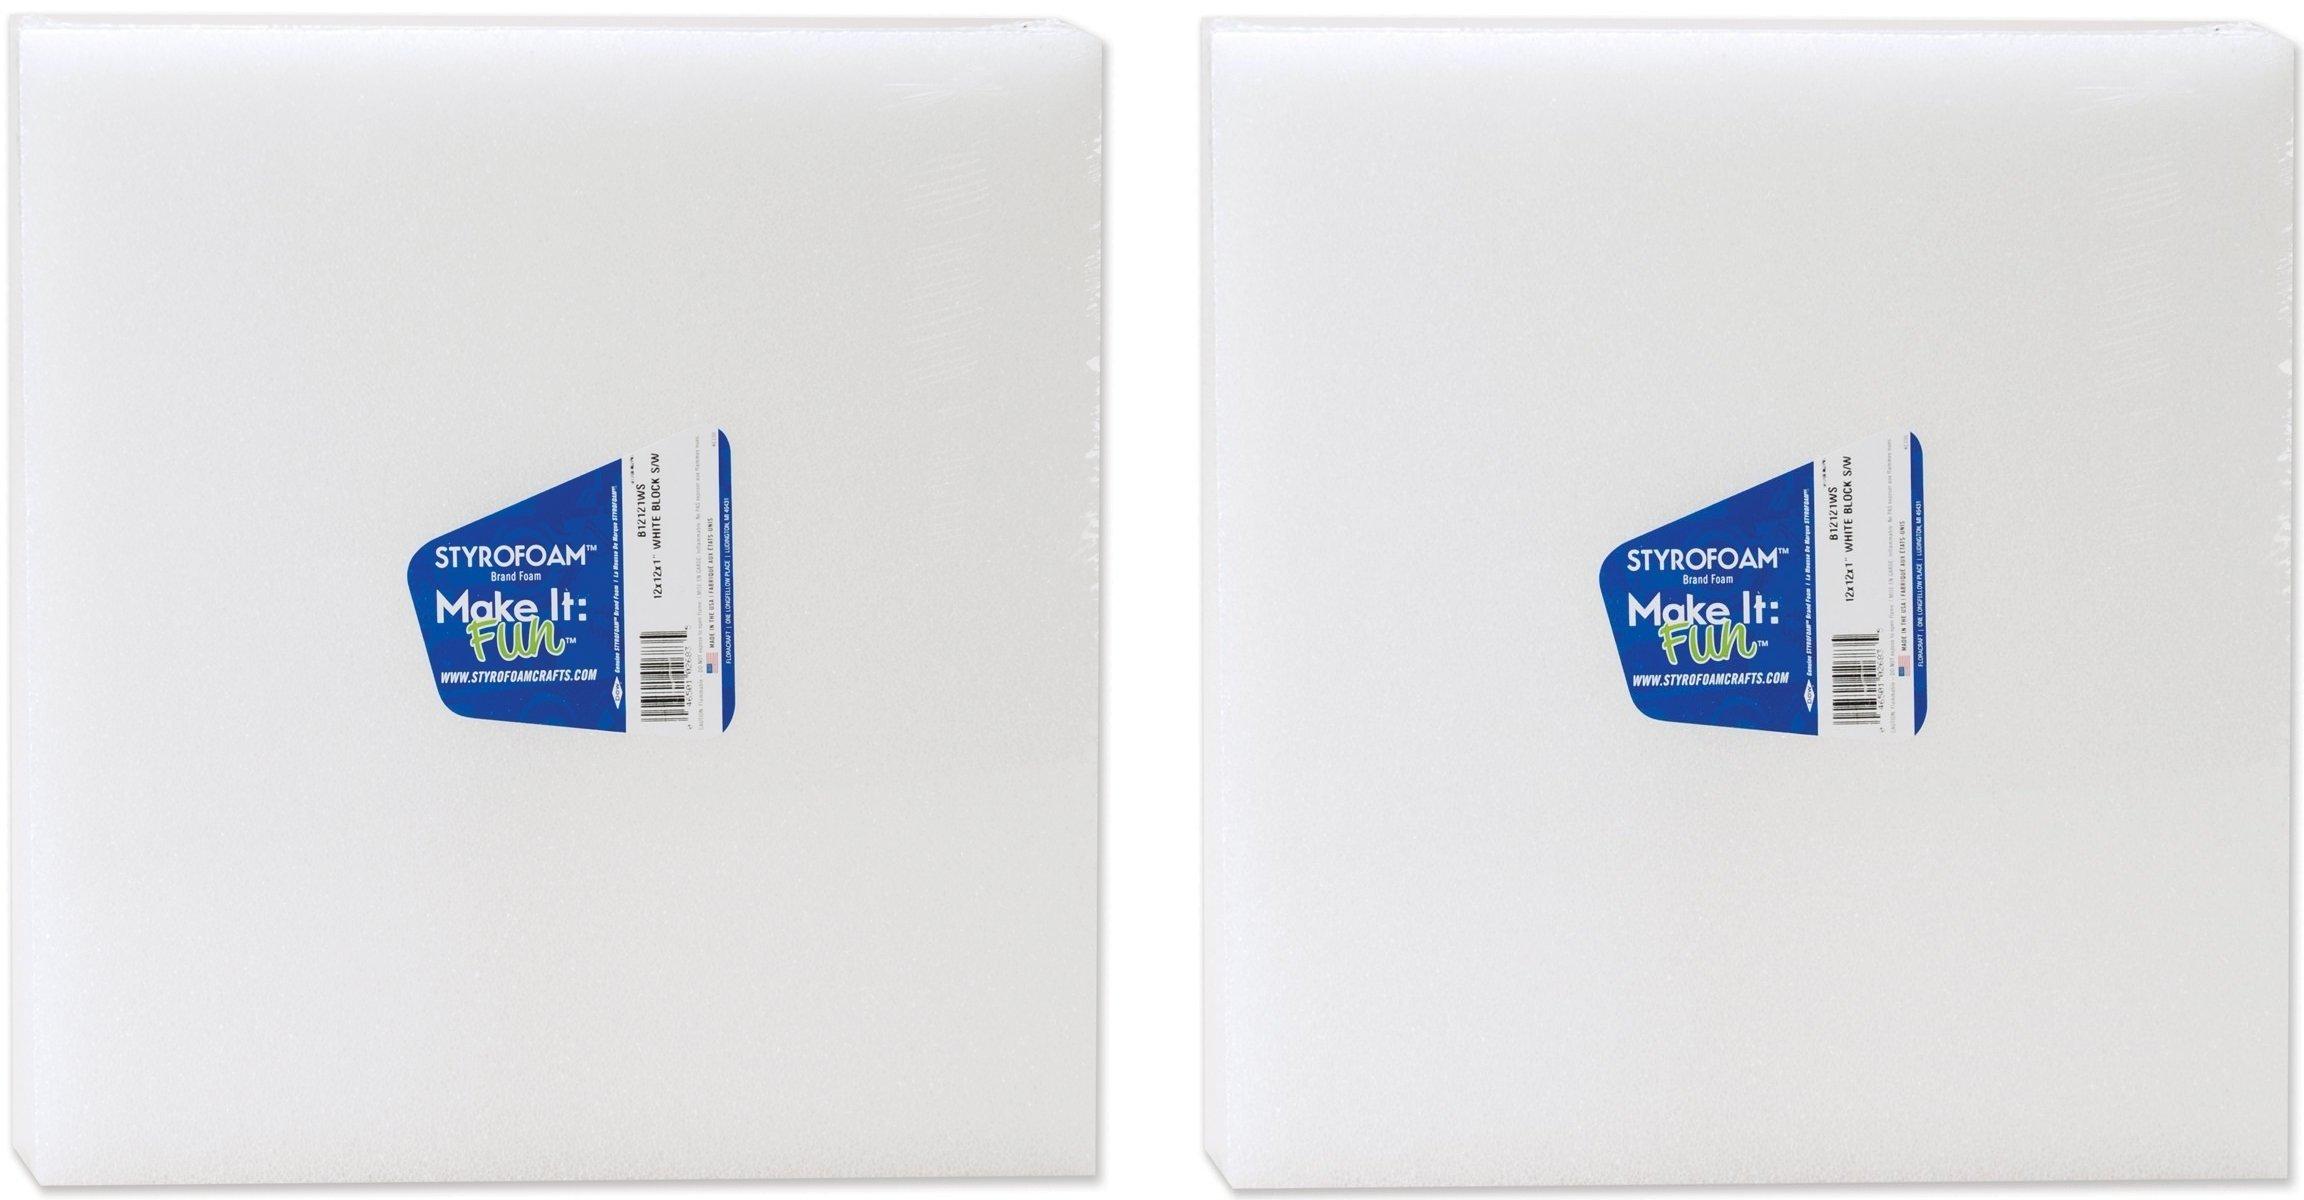 Styrofoam White Block 12 Inch X 12 Inch X 1 Inch (2 Pack)